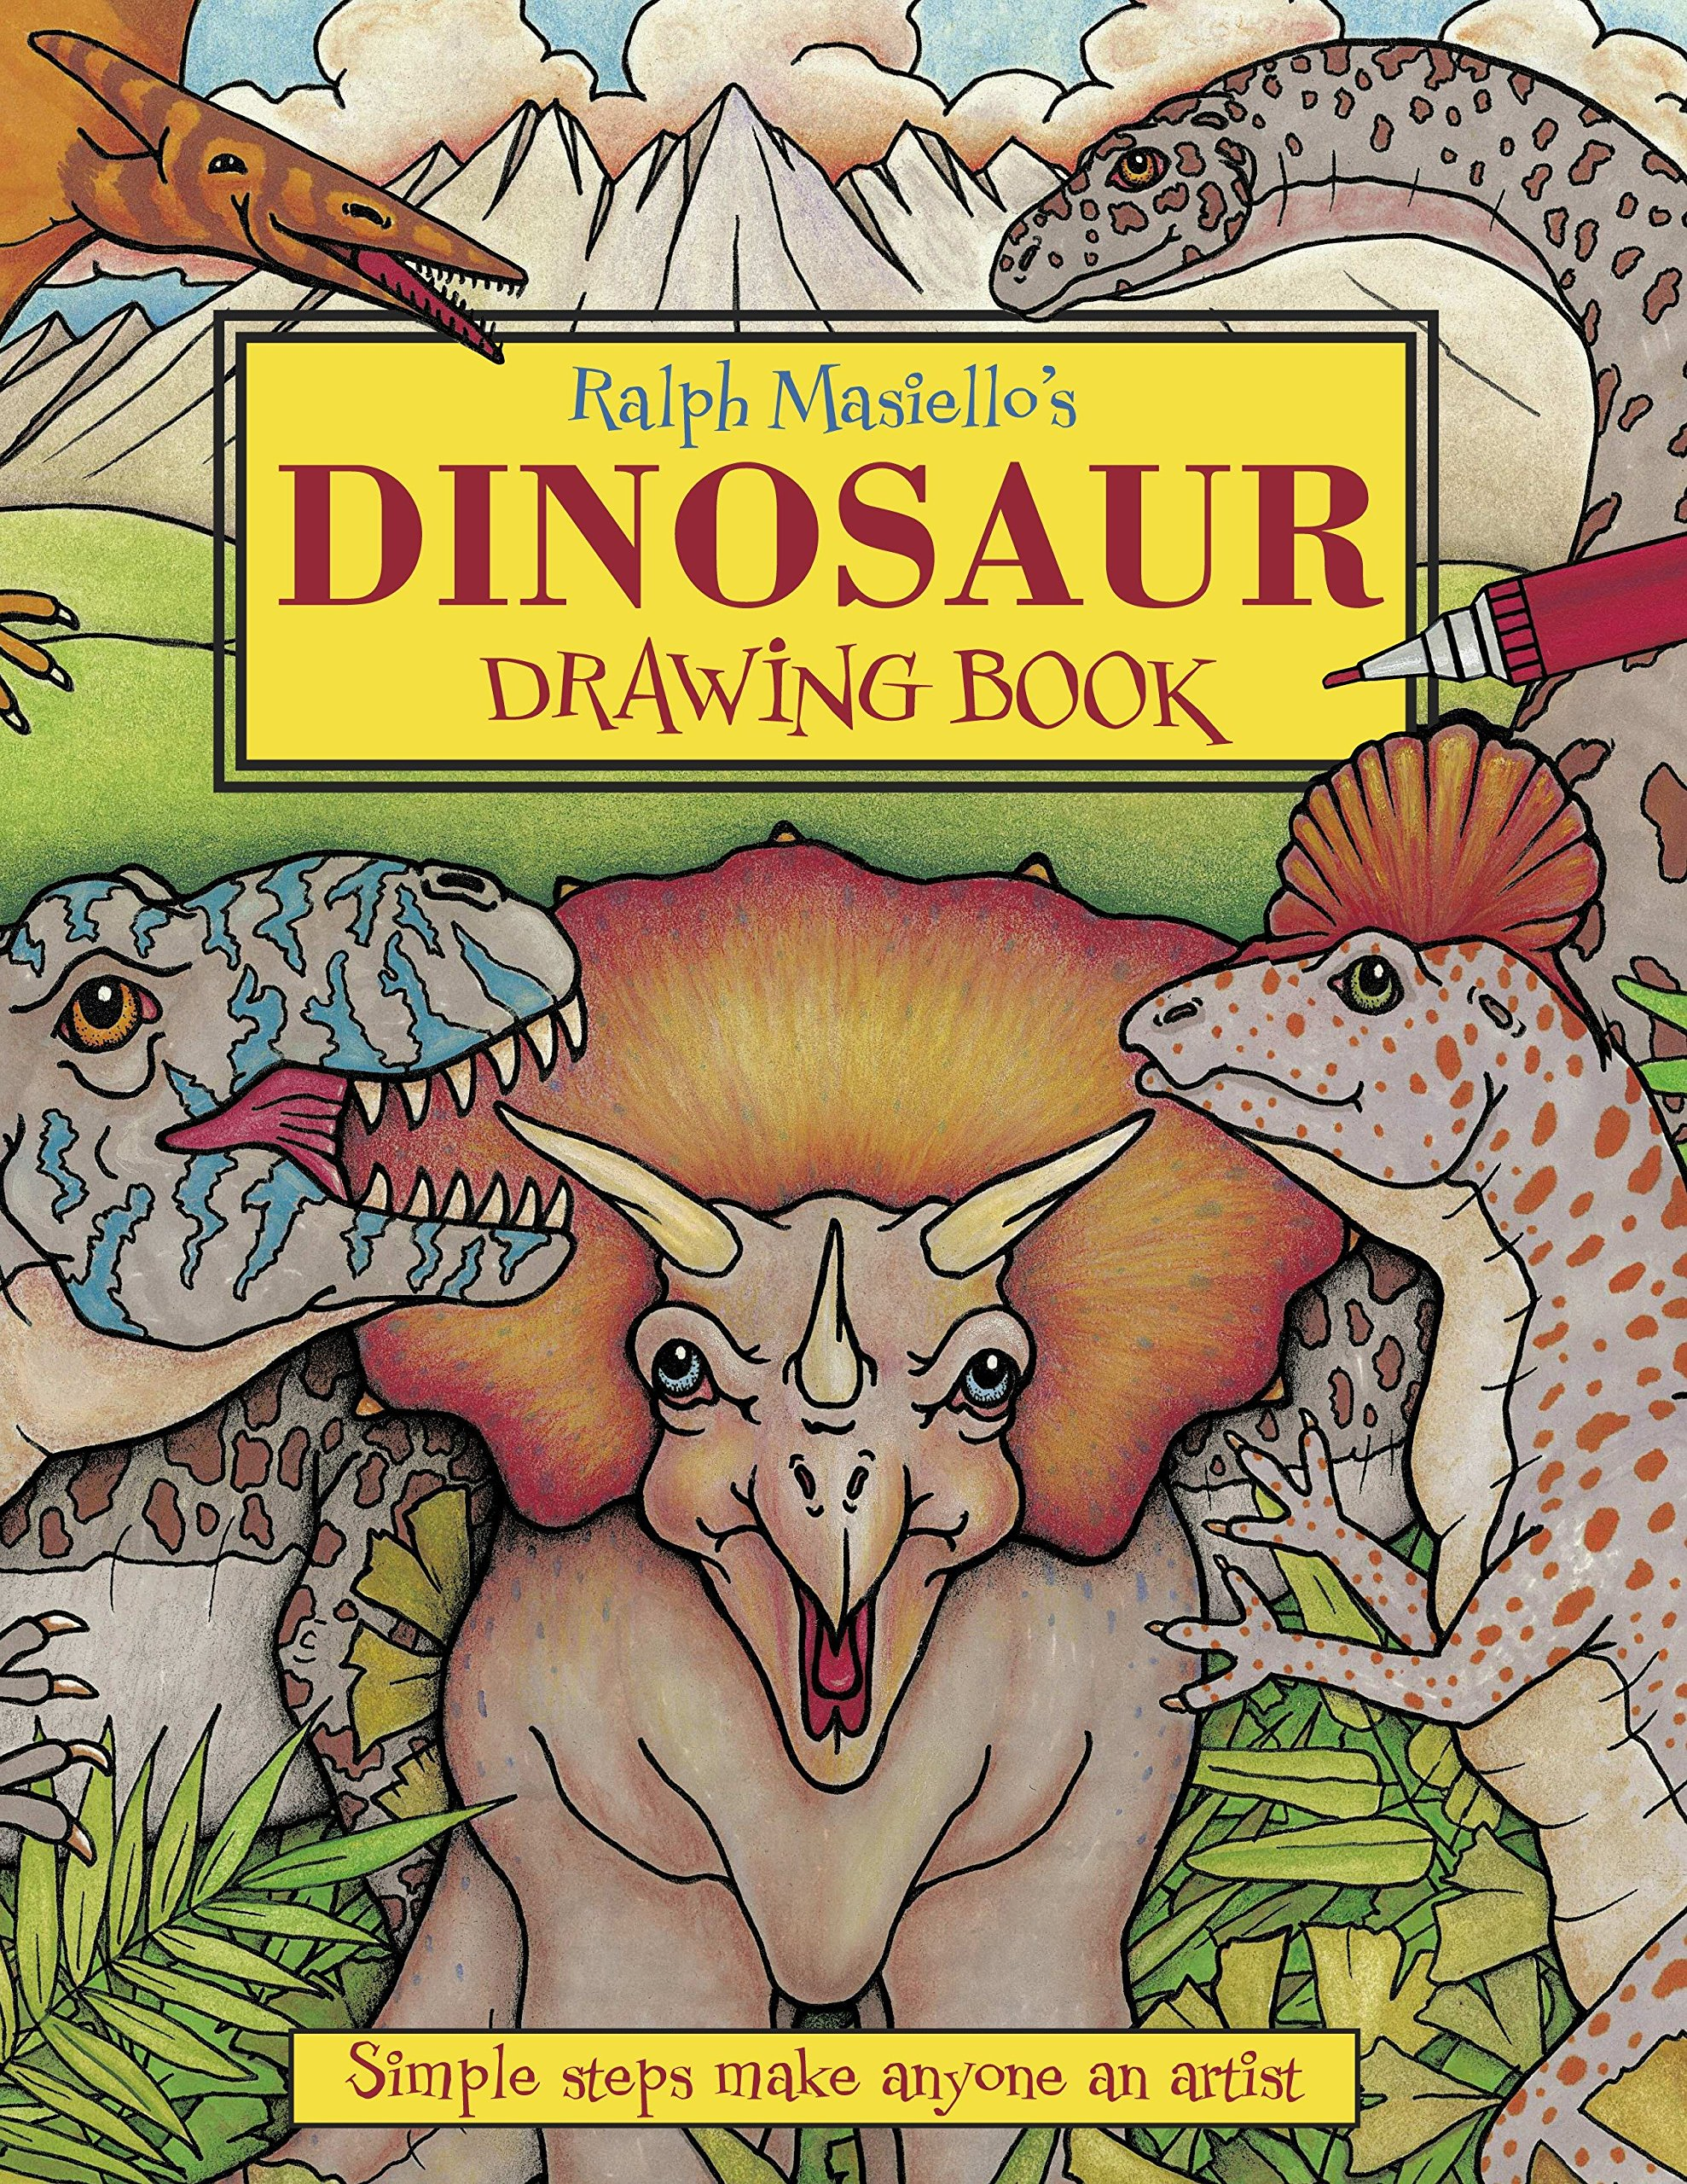 Ralph Masiello's Dinosaur Drawing Book (Ralph Masiello's Drawing Books) Paperback – July 1, 2005 Charlesbridge 1570915288 JNF006020 Dinosaurs in art